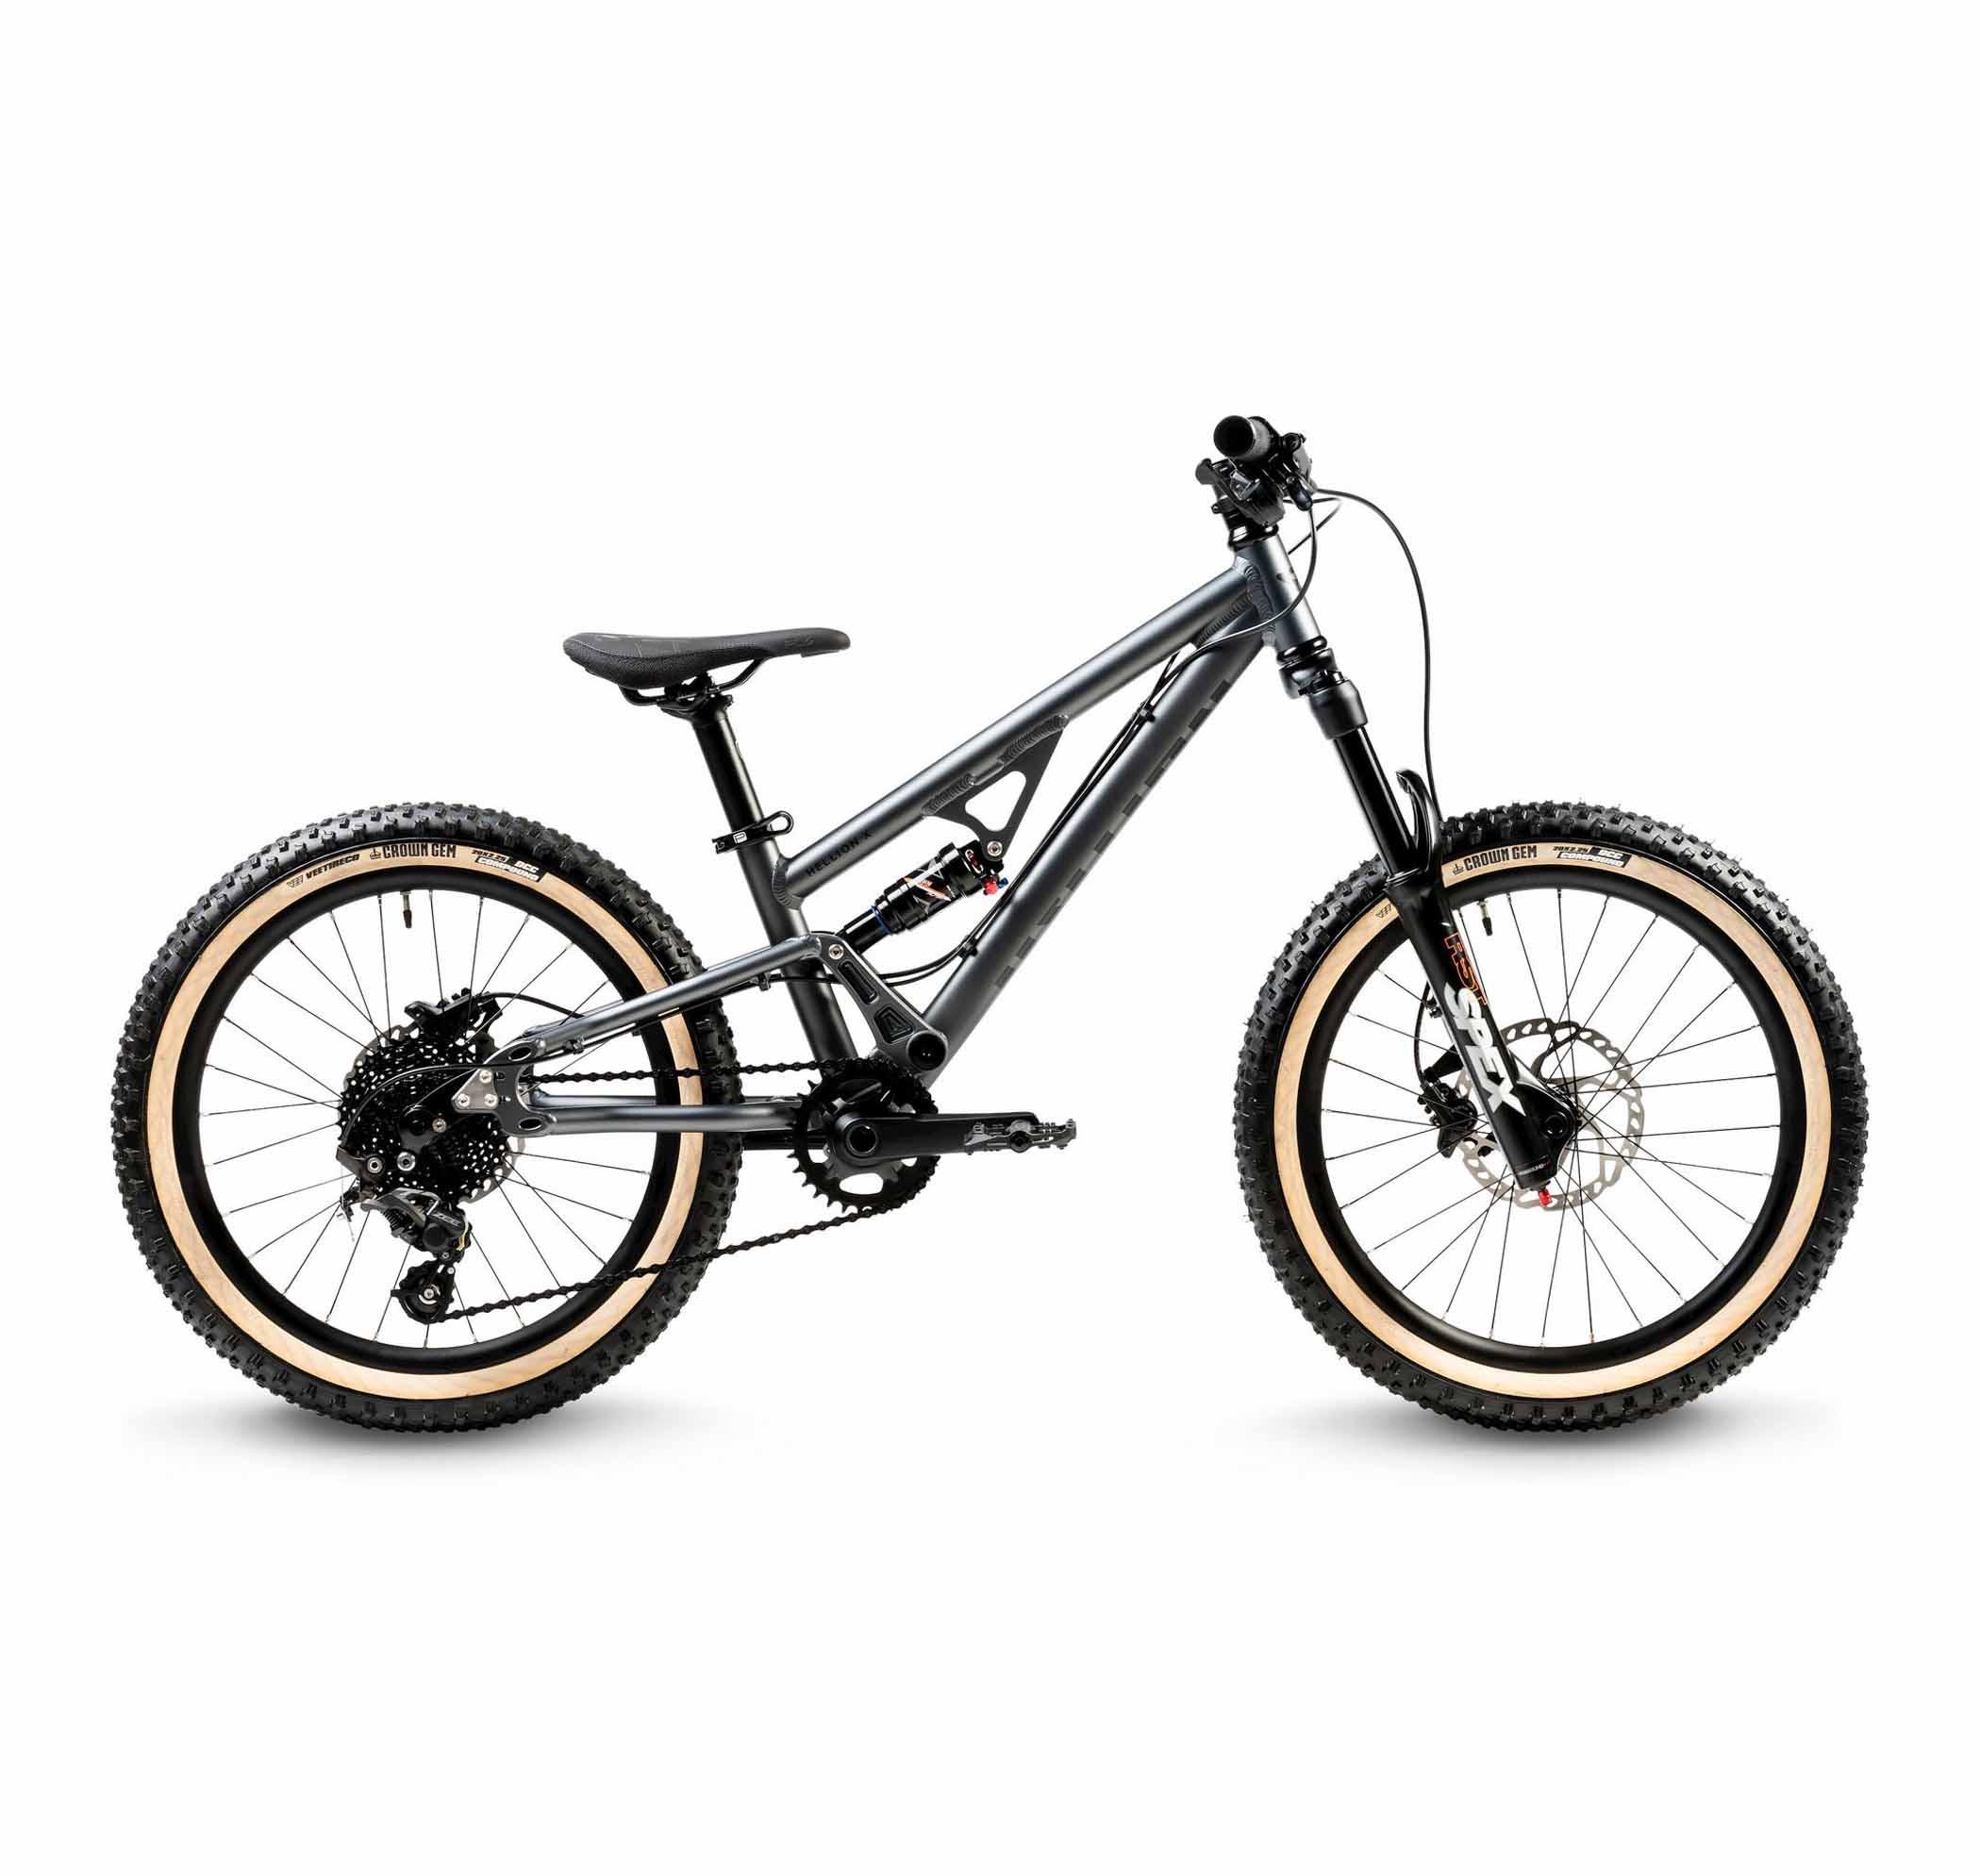 Early_Rider_Rodeo_Bike_Hellion_x20